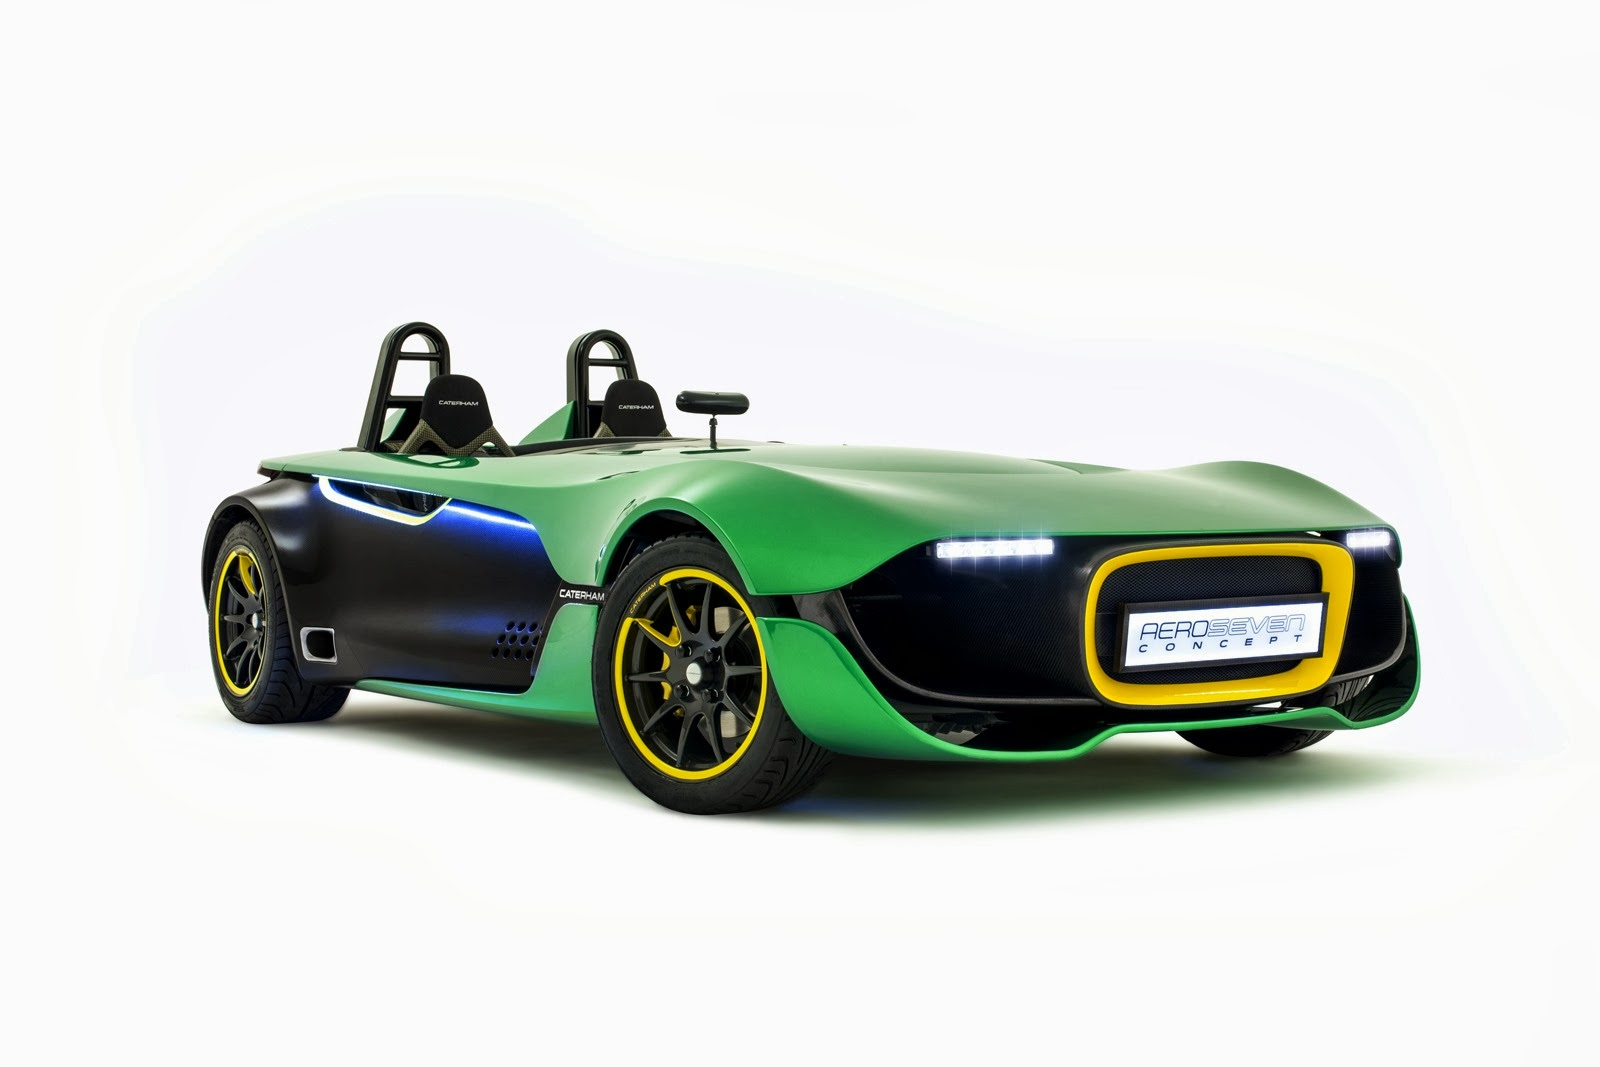 Caterham-Aero-Seven-Concept-1